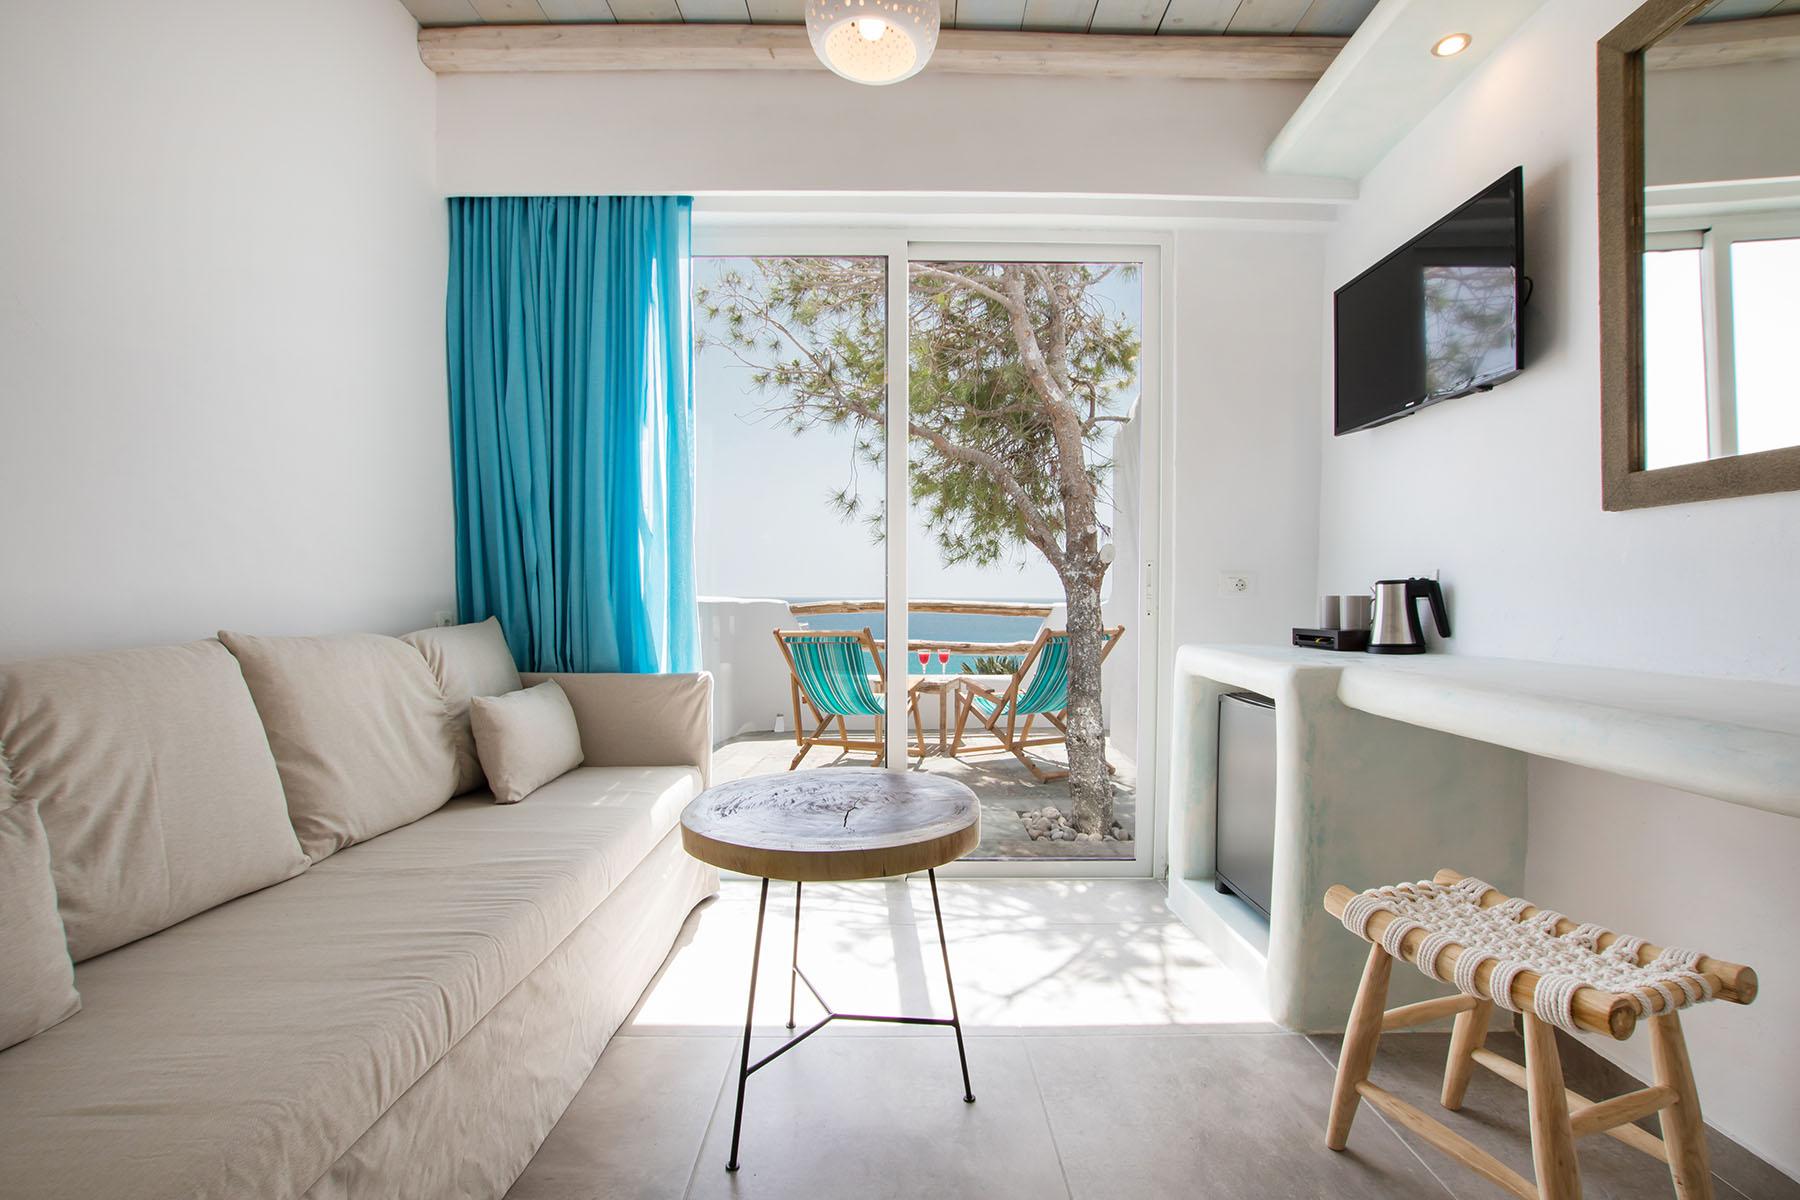 accommodation in karpathos - Poseidon Blue Gastronomy Hotel